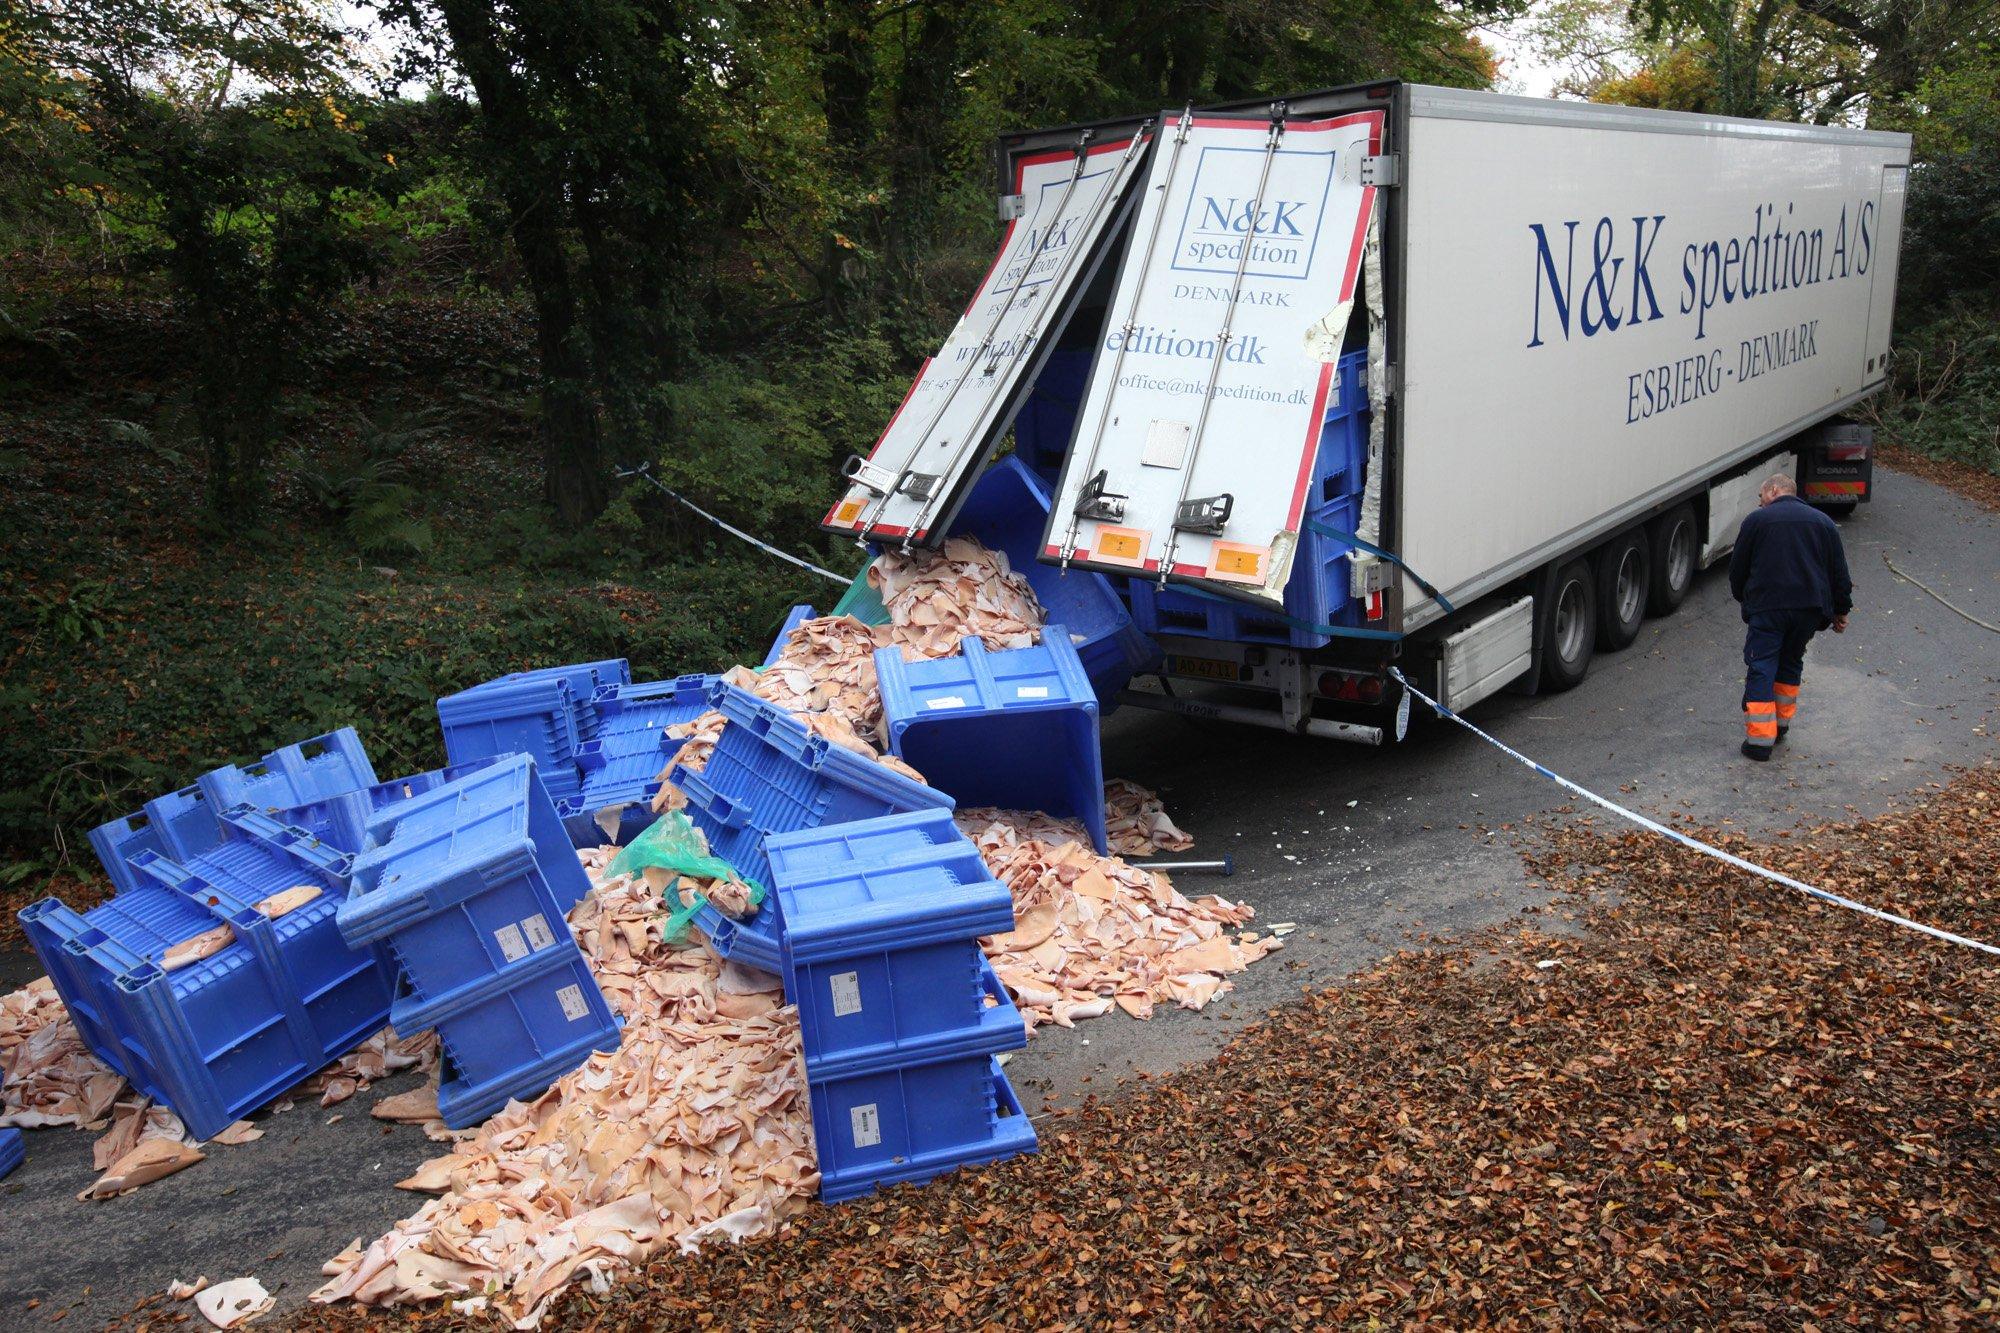 Lorry spills pig flesh all over the road after dodgy sat-nav diversion